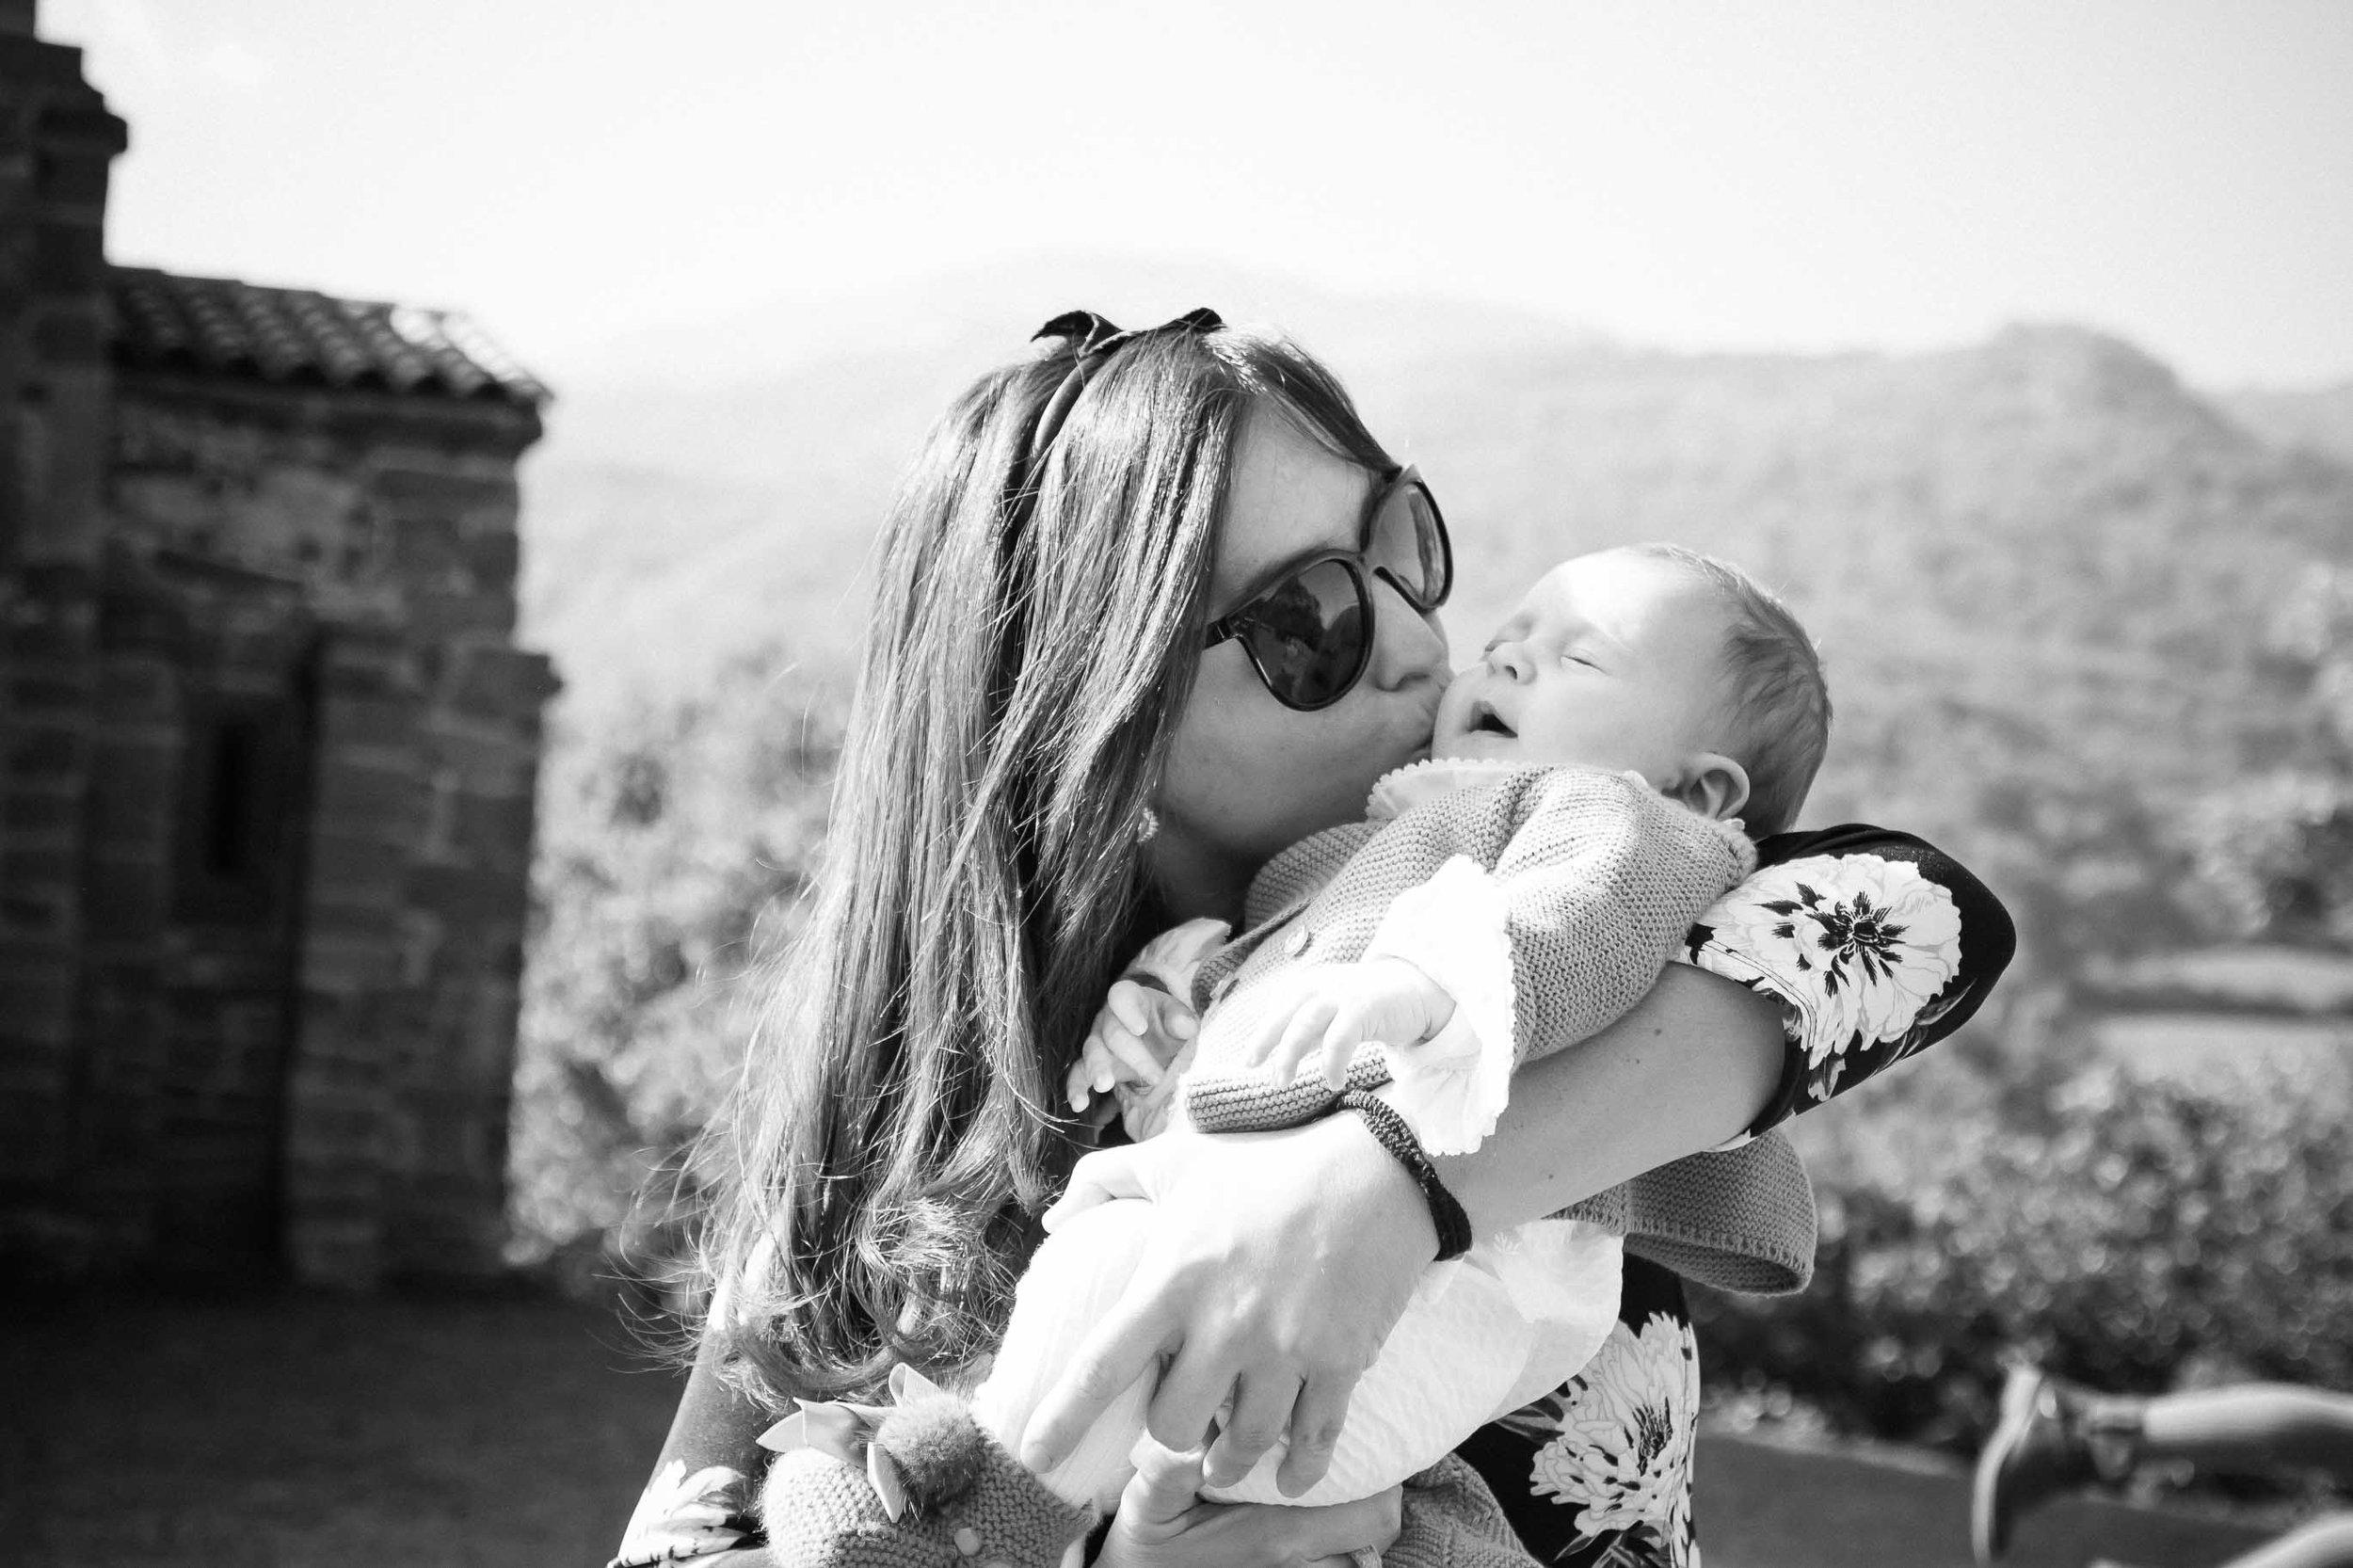 bautizo en pola de lena asturias fotografo bebes-21.JPG